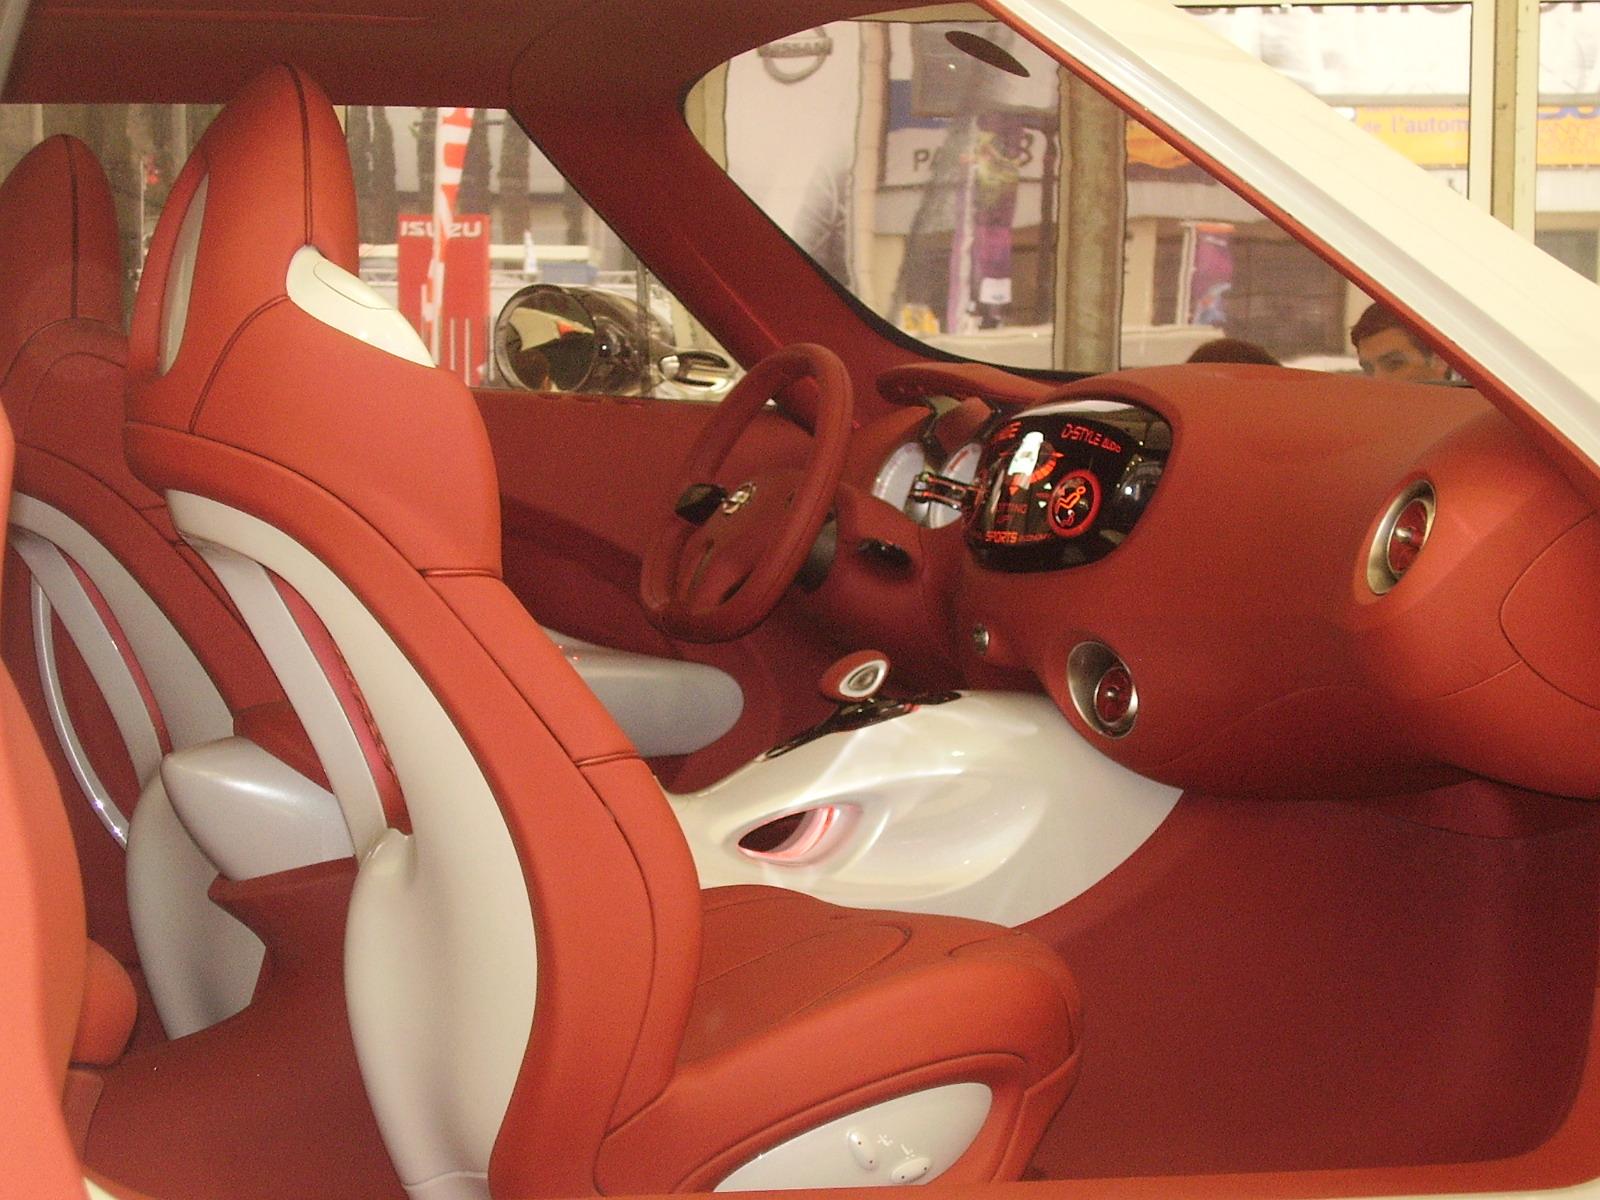 Visita Salon Automovil 09 BCN / Visit to Car Exhibition 09 Barcelona-P5140732.JPG